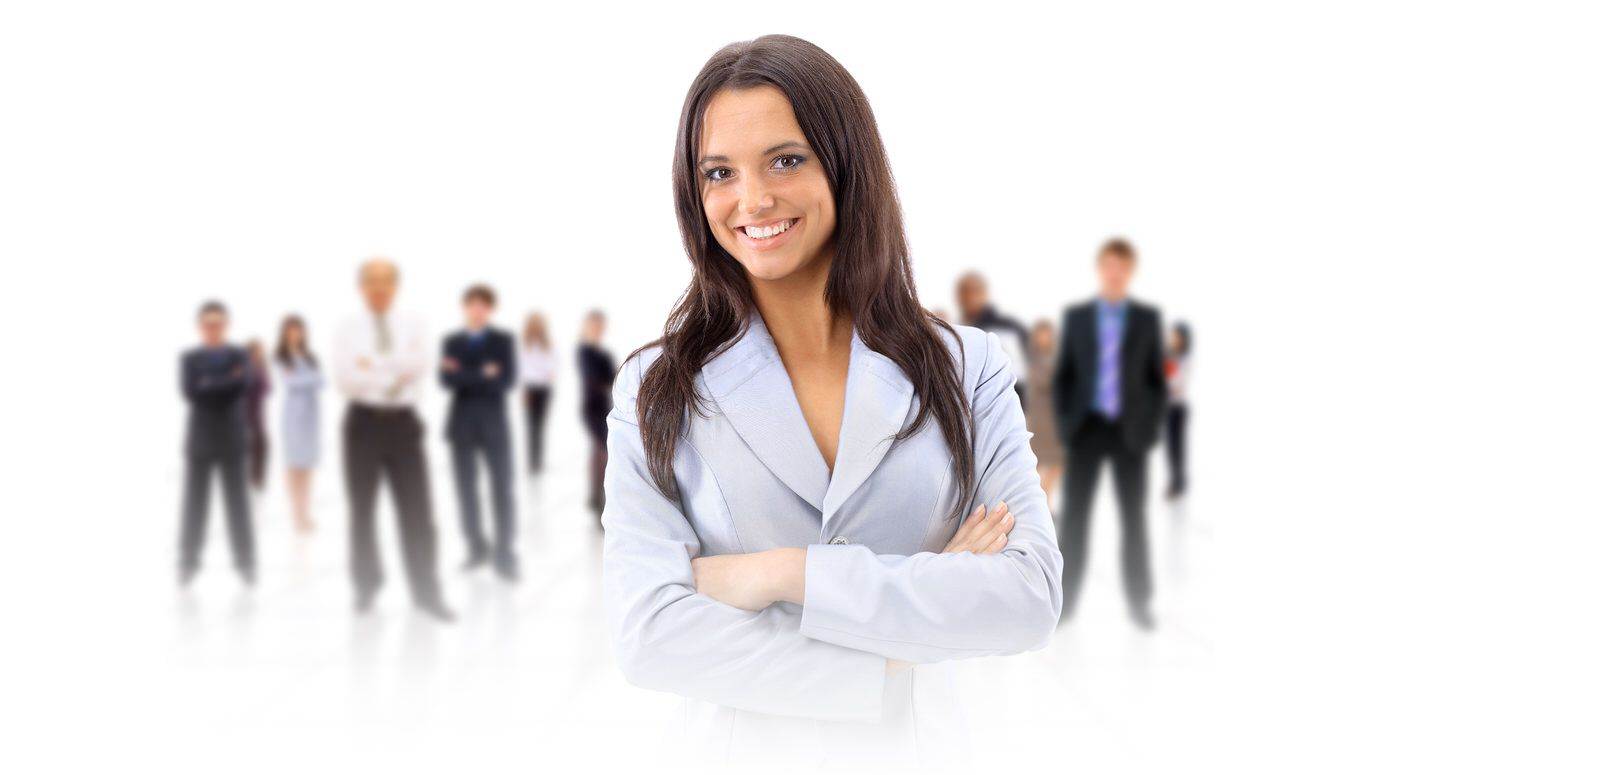 MCA Independent Associate Careers Employee training